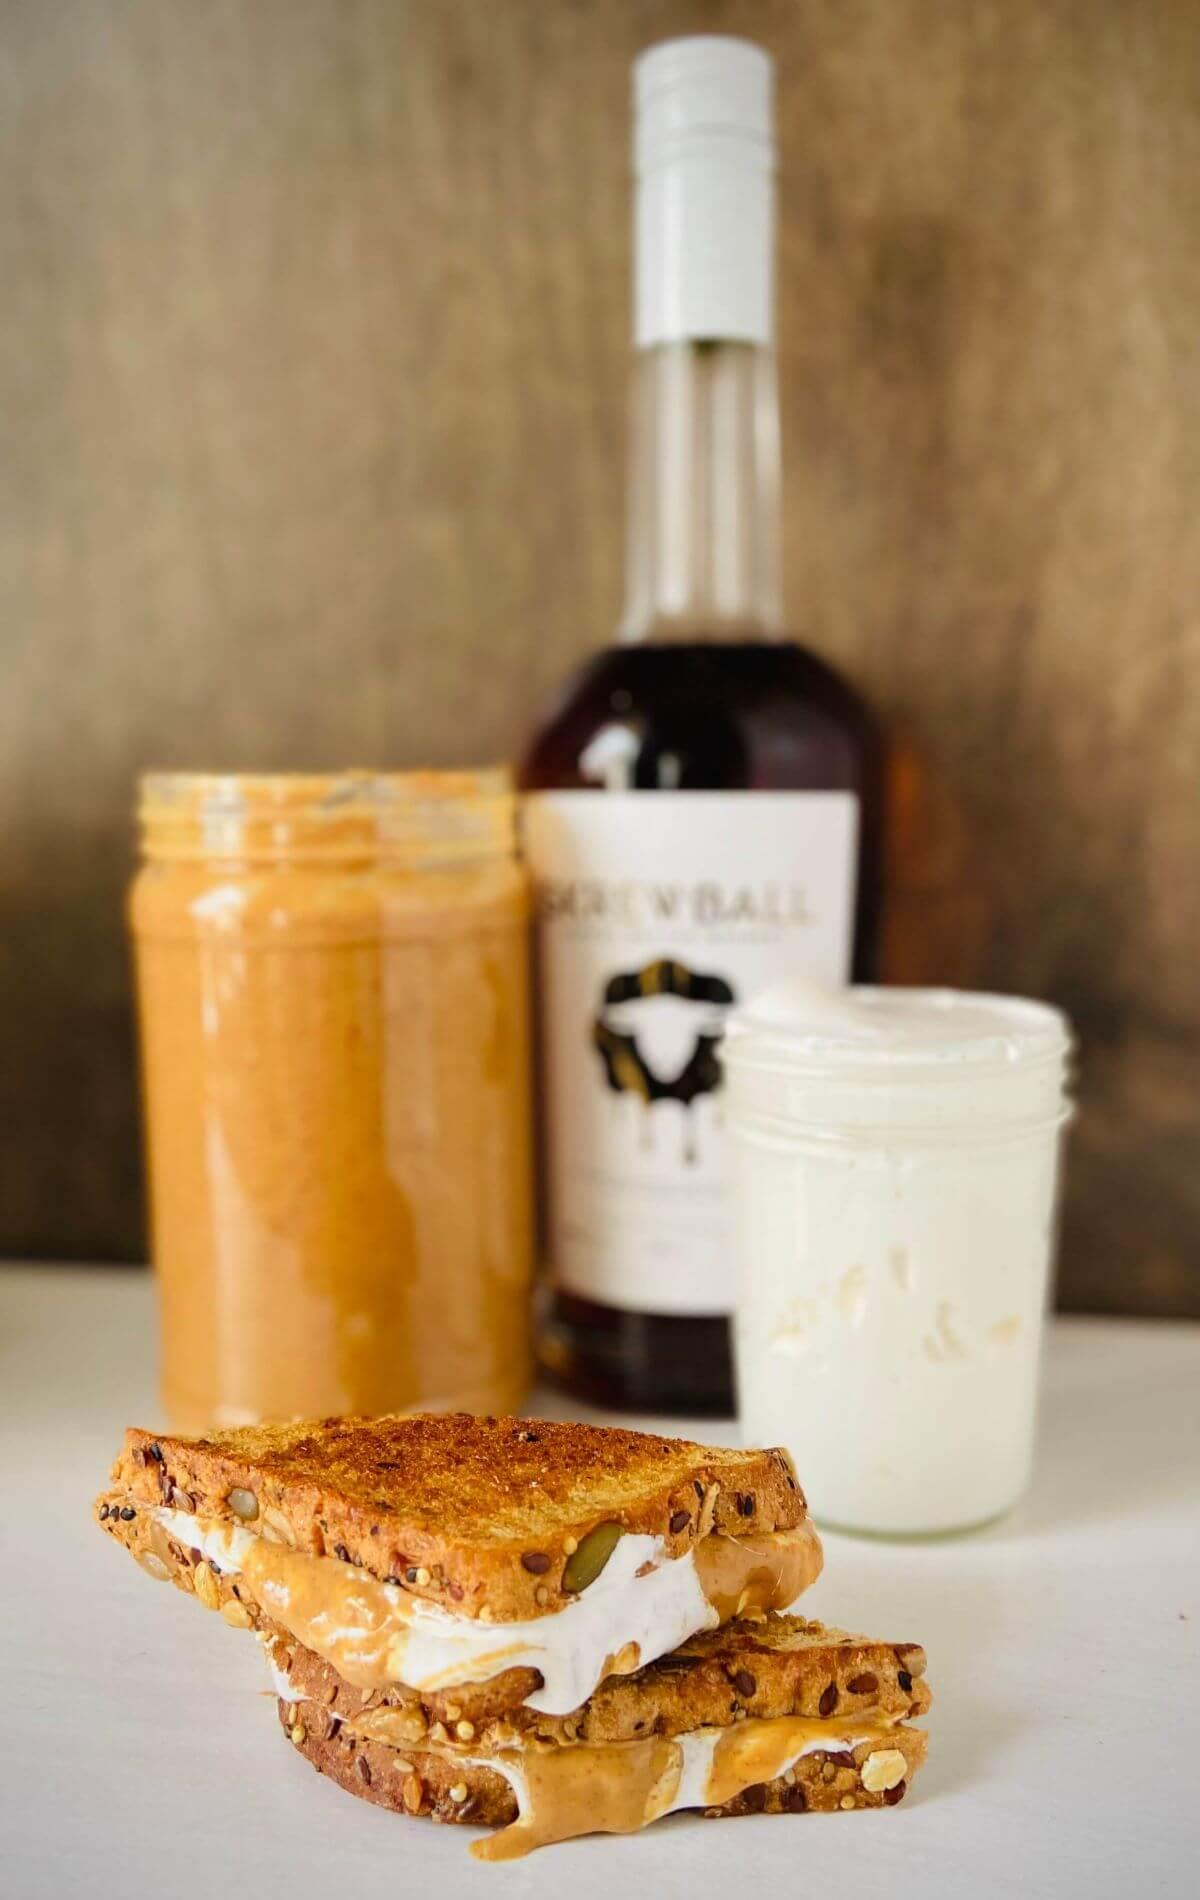 Grilled fluffernutter sandwich with a jar of peanut butter, marshmallow fluff, and peanut butter whiskey